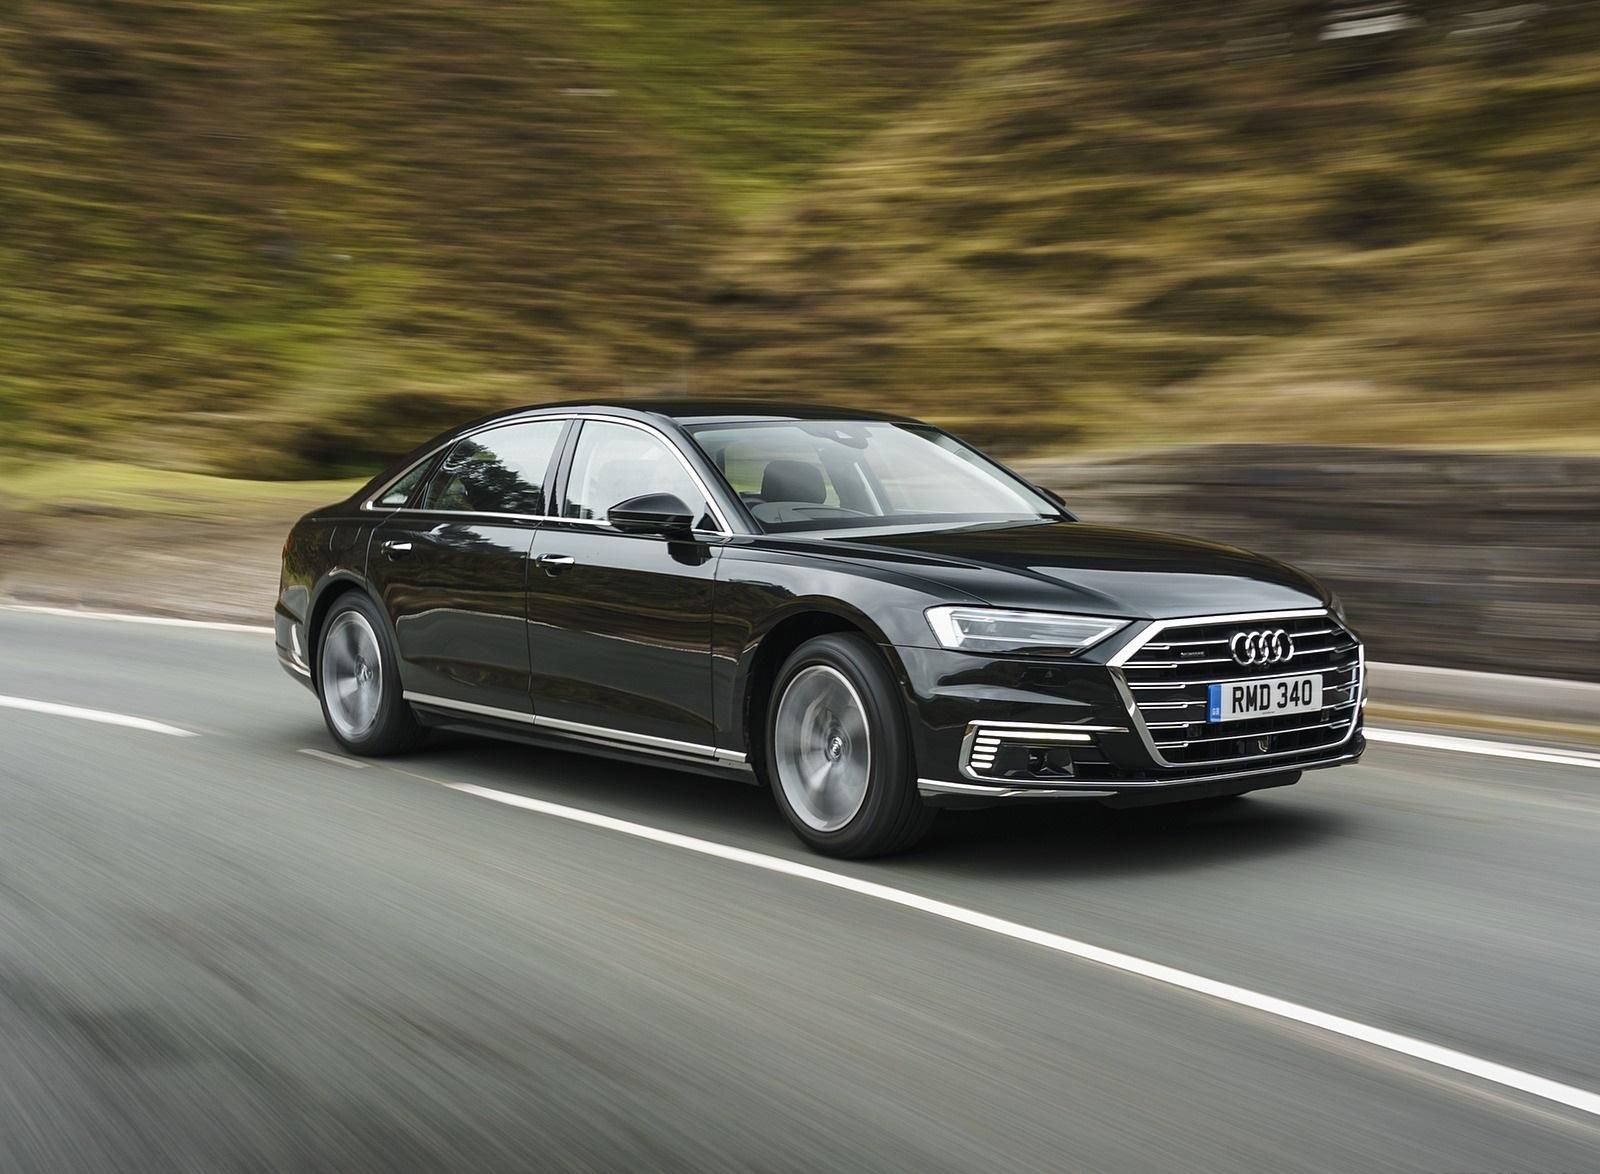 2020 Audi A8 L 60 TFSI e quattro (Plug-In Hybrid UK-Spec) Front Three-Quarter Wallpapers (3)